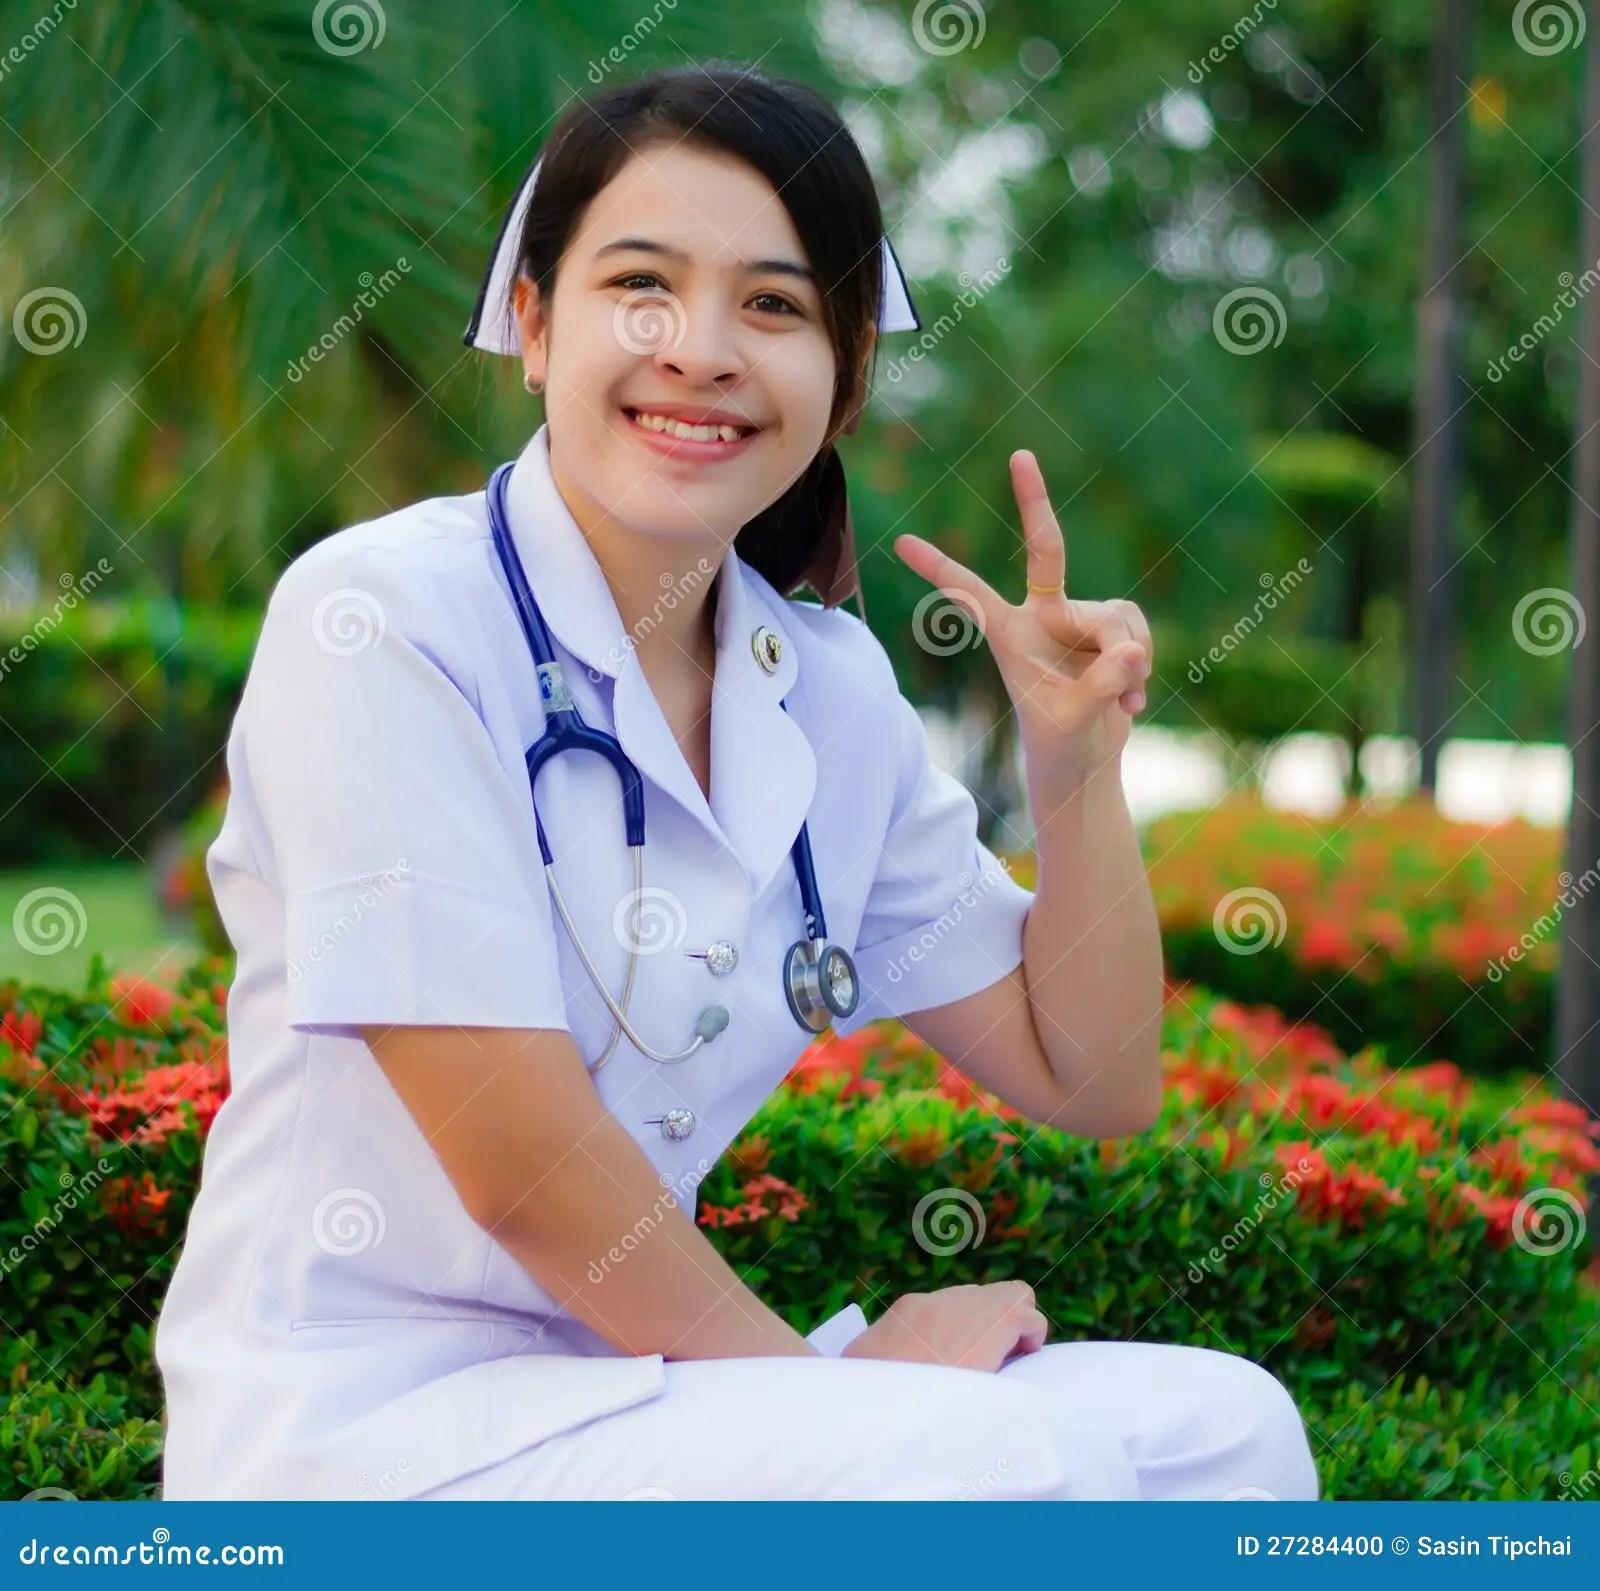 Thai Nurse Smiling With Stethoscope Stock Photo  Image